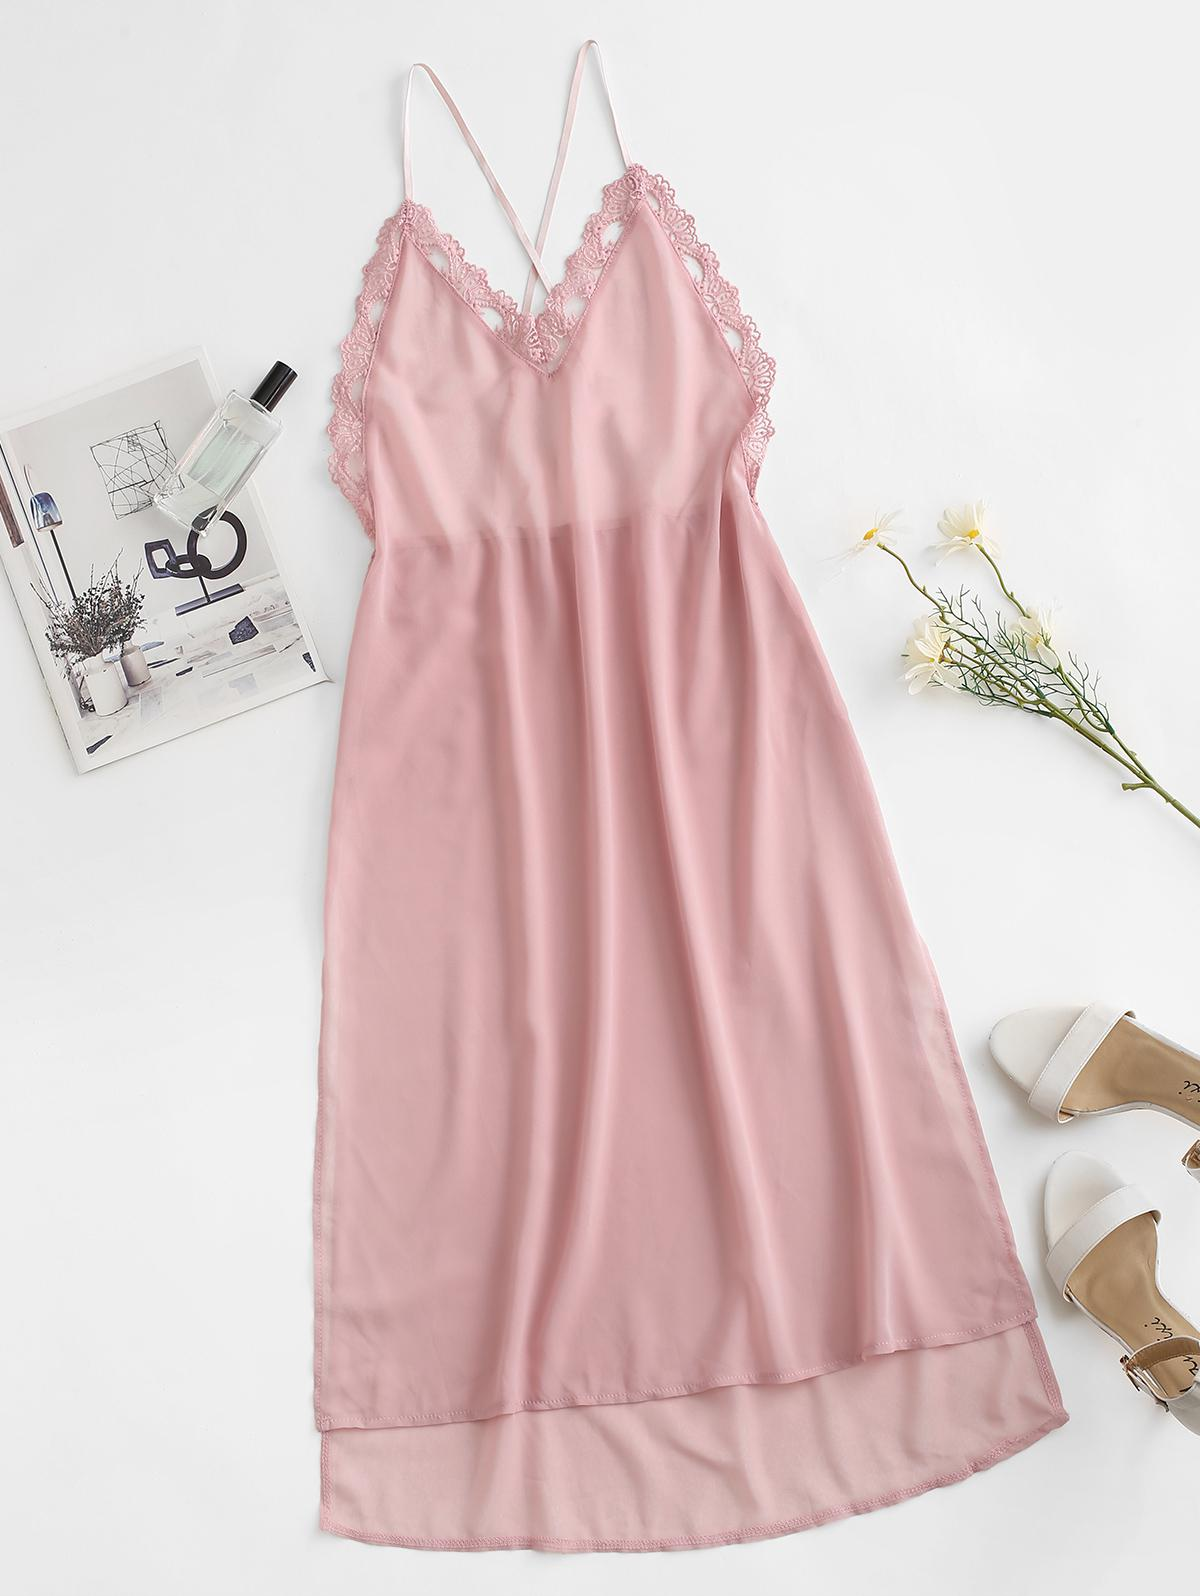 Lace Trim Criss Cross Slit High Low Sleep Dress